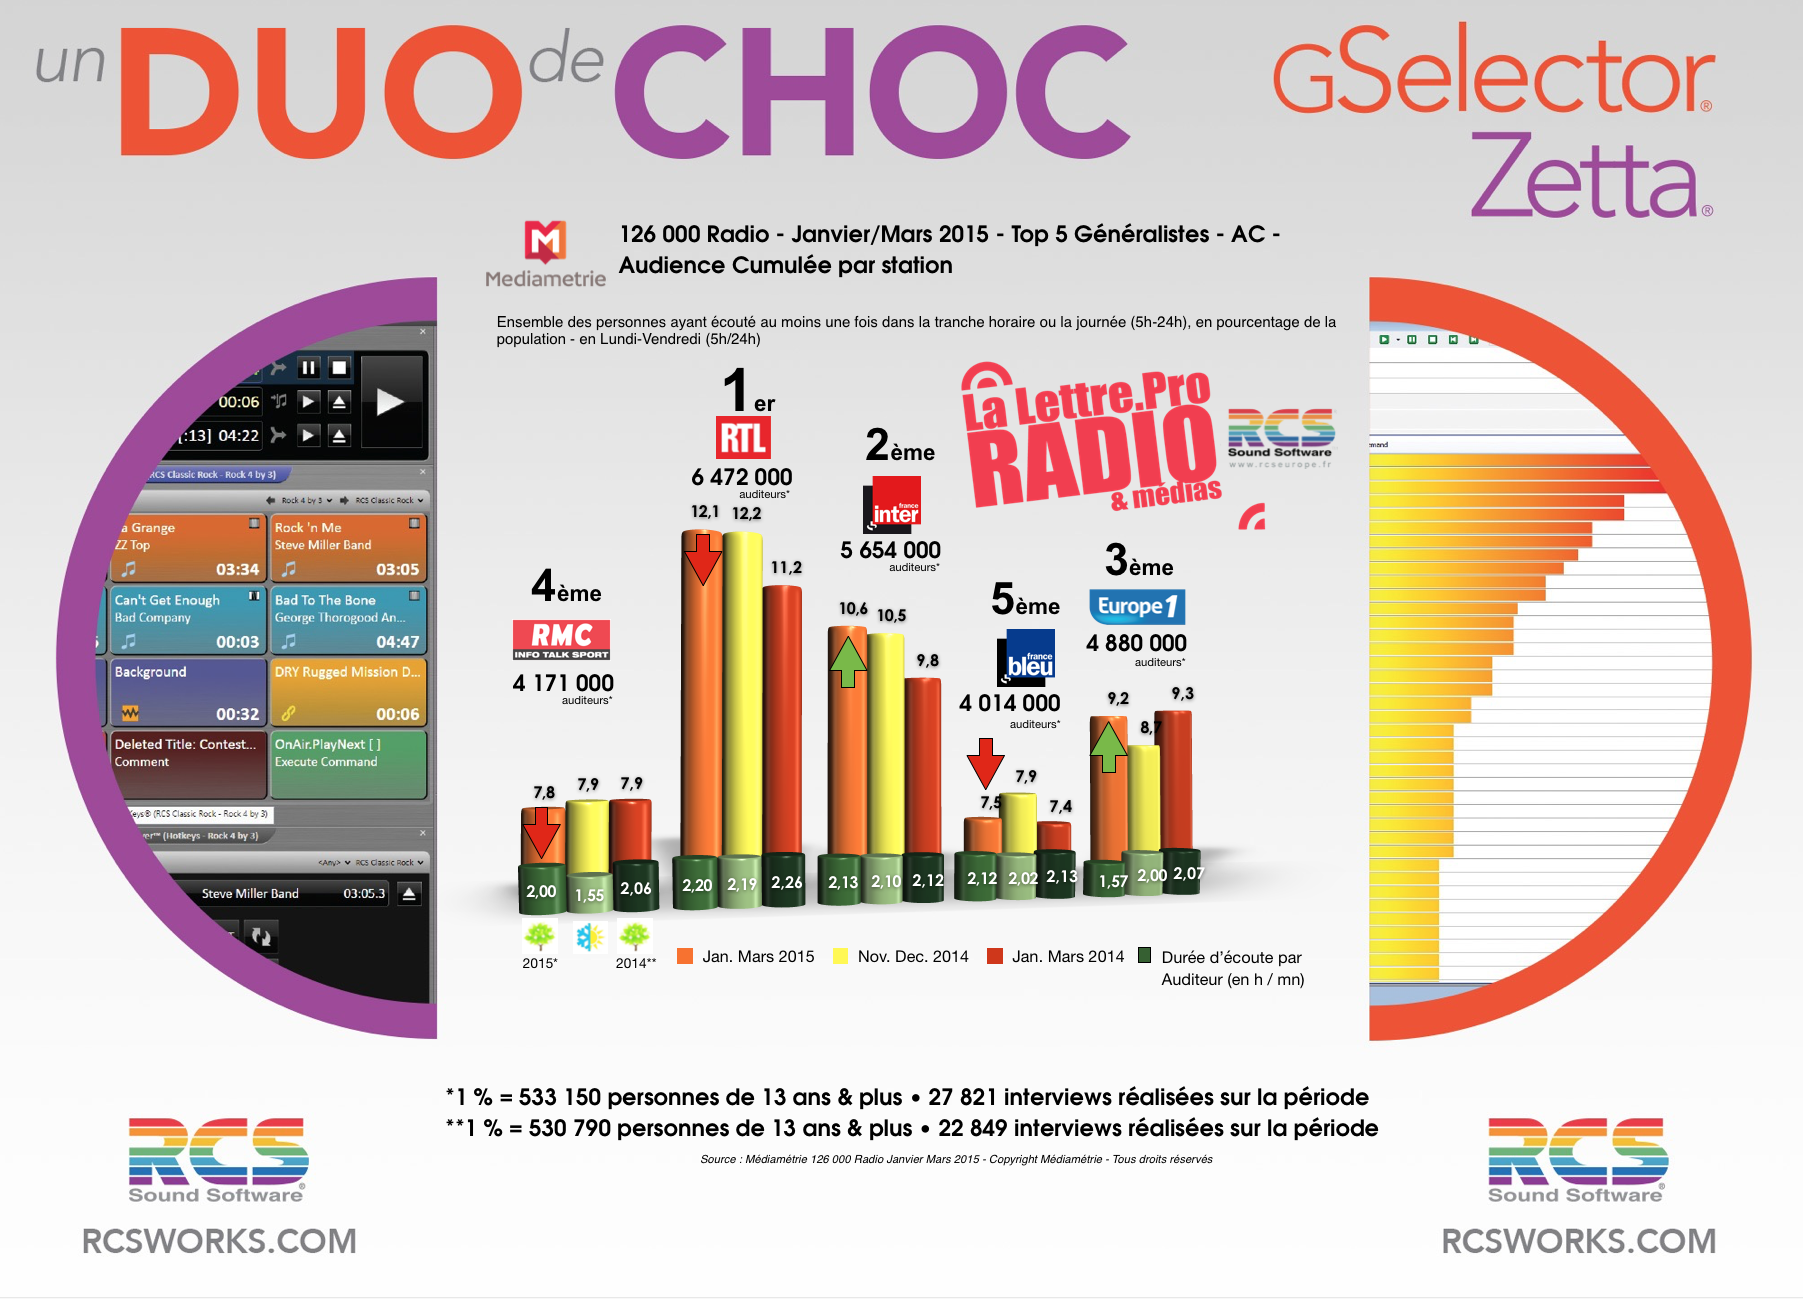 TOP 5 Généralistes - Diagramme exclusif LLP/RCS GSelector-Zetta - Janvier-Mars 2015